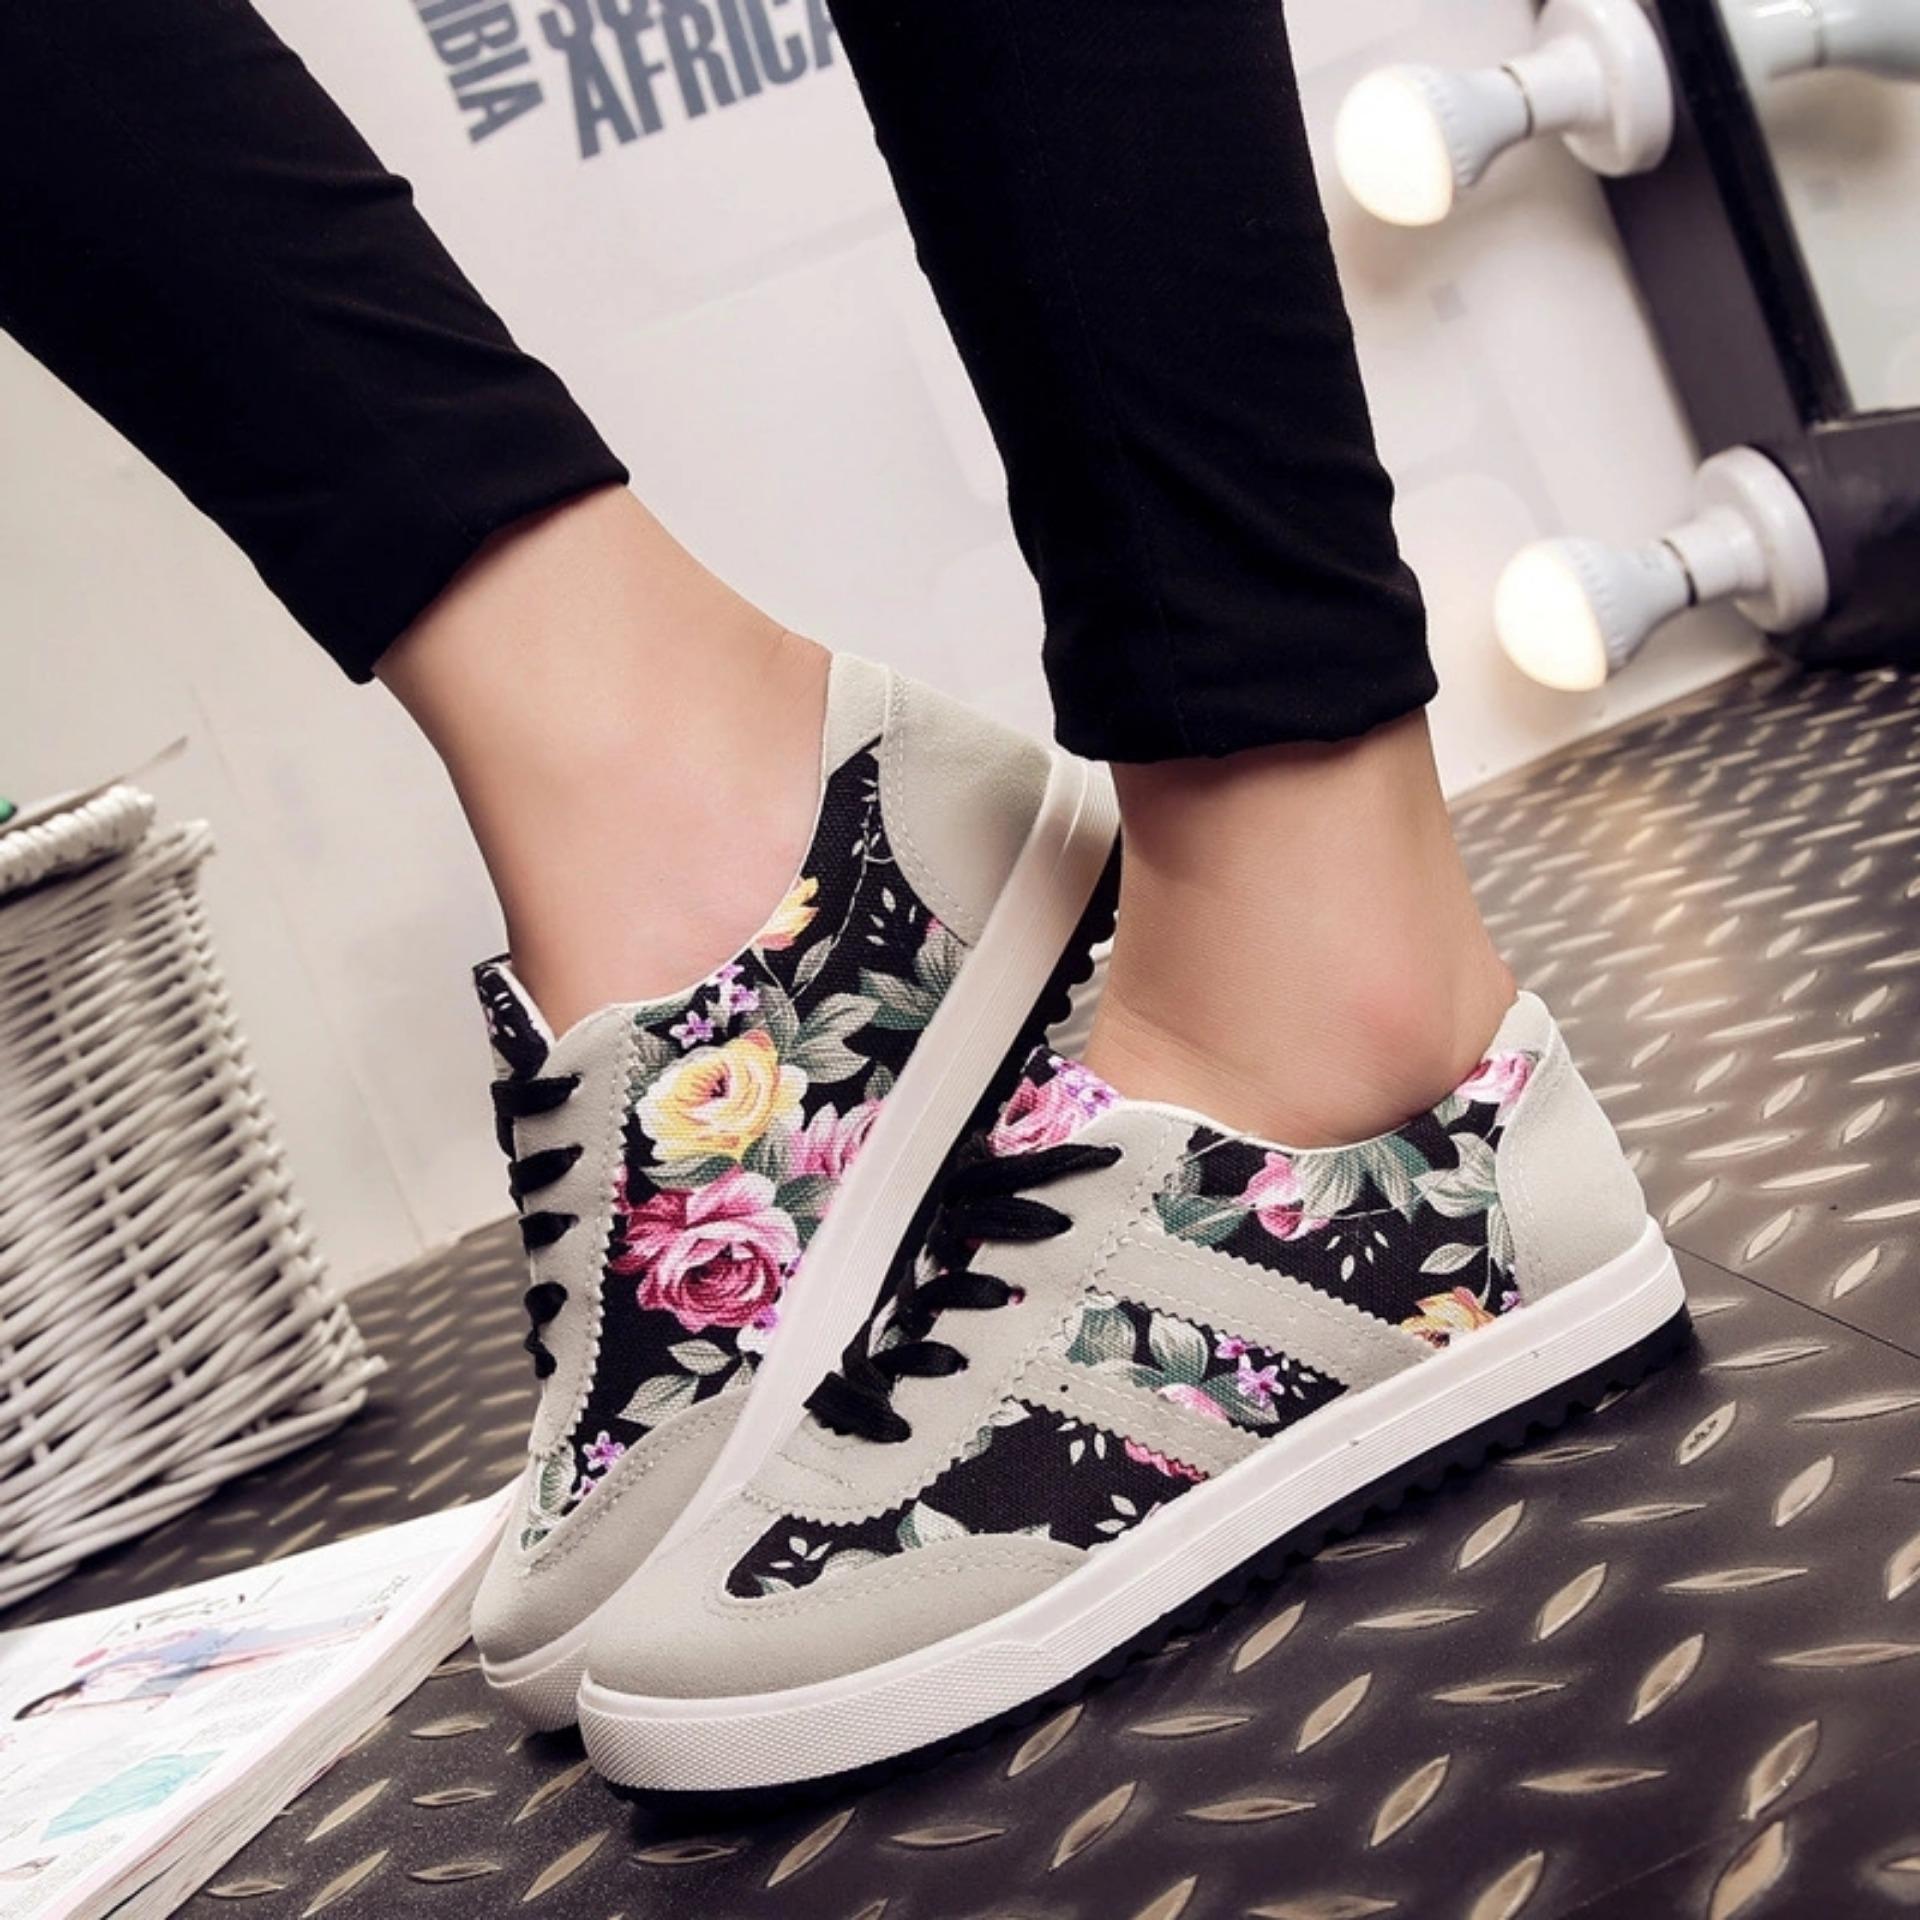 azkashoes Sepatu Wanita Sneaker Bunga AK01 Hitam